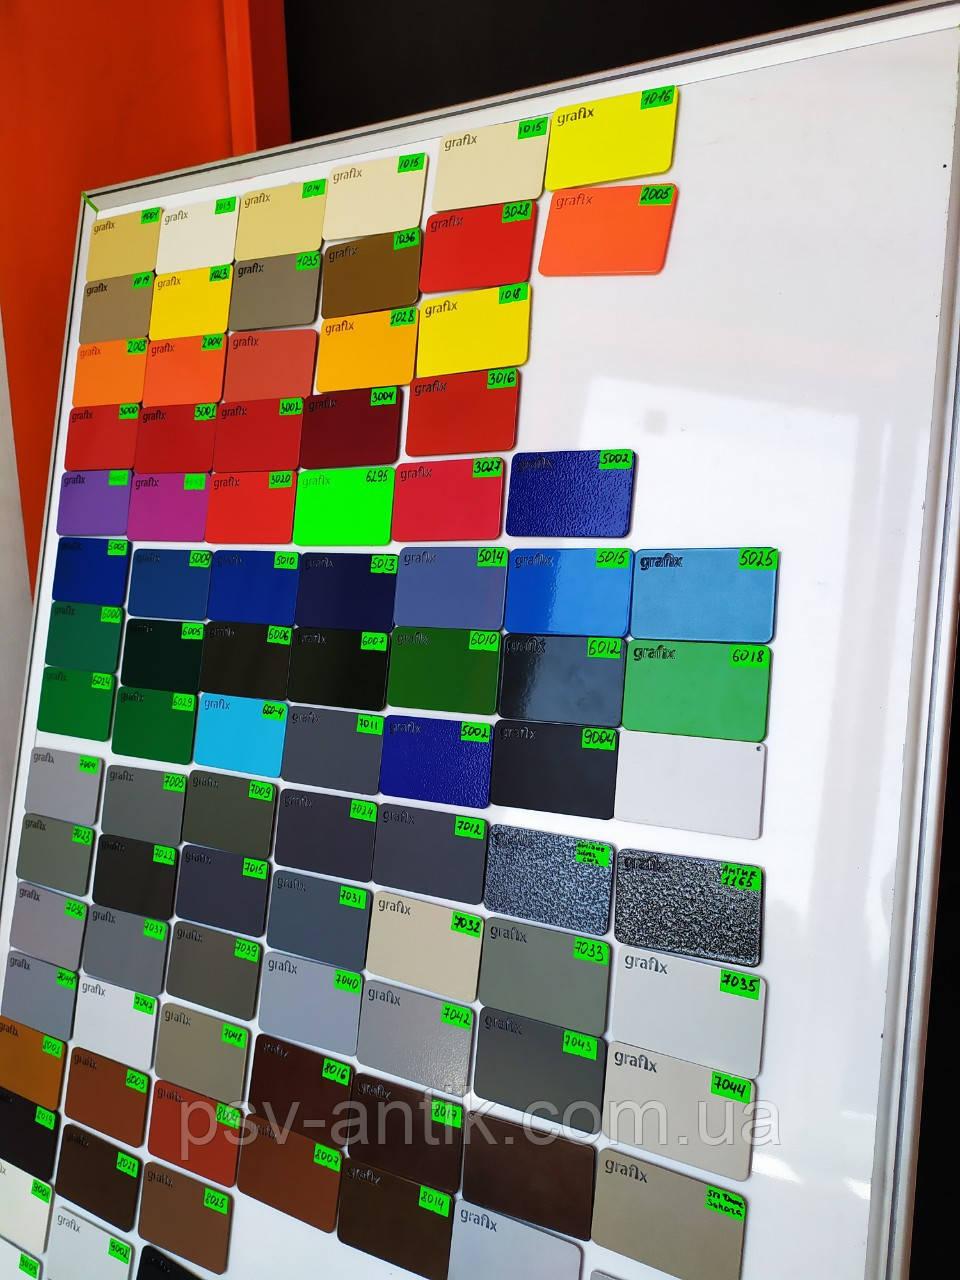 Порошковая краска глянцевая, полиэфирная, архитектурная, 7024